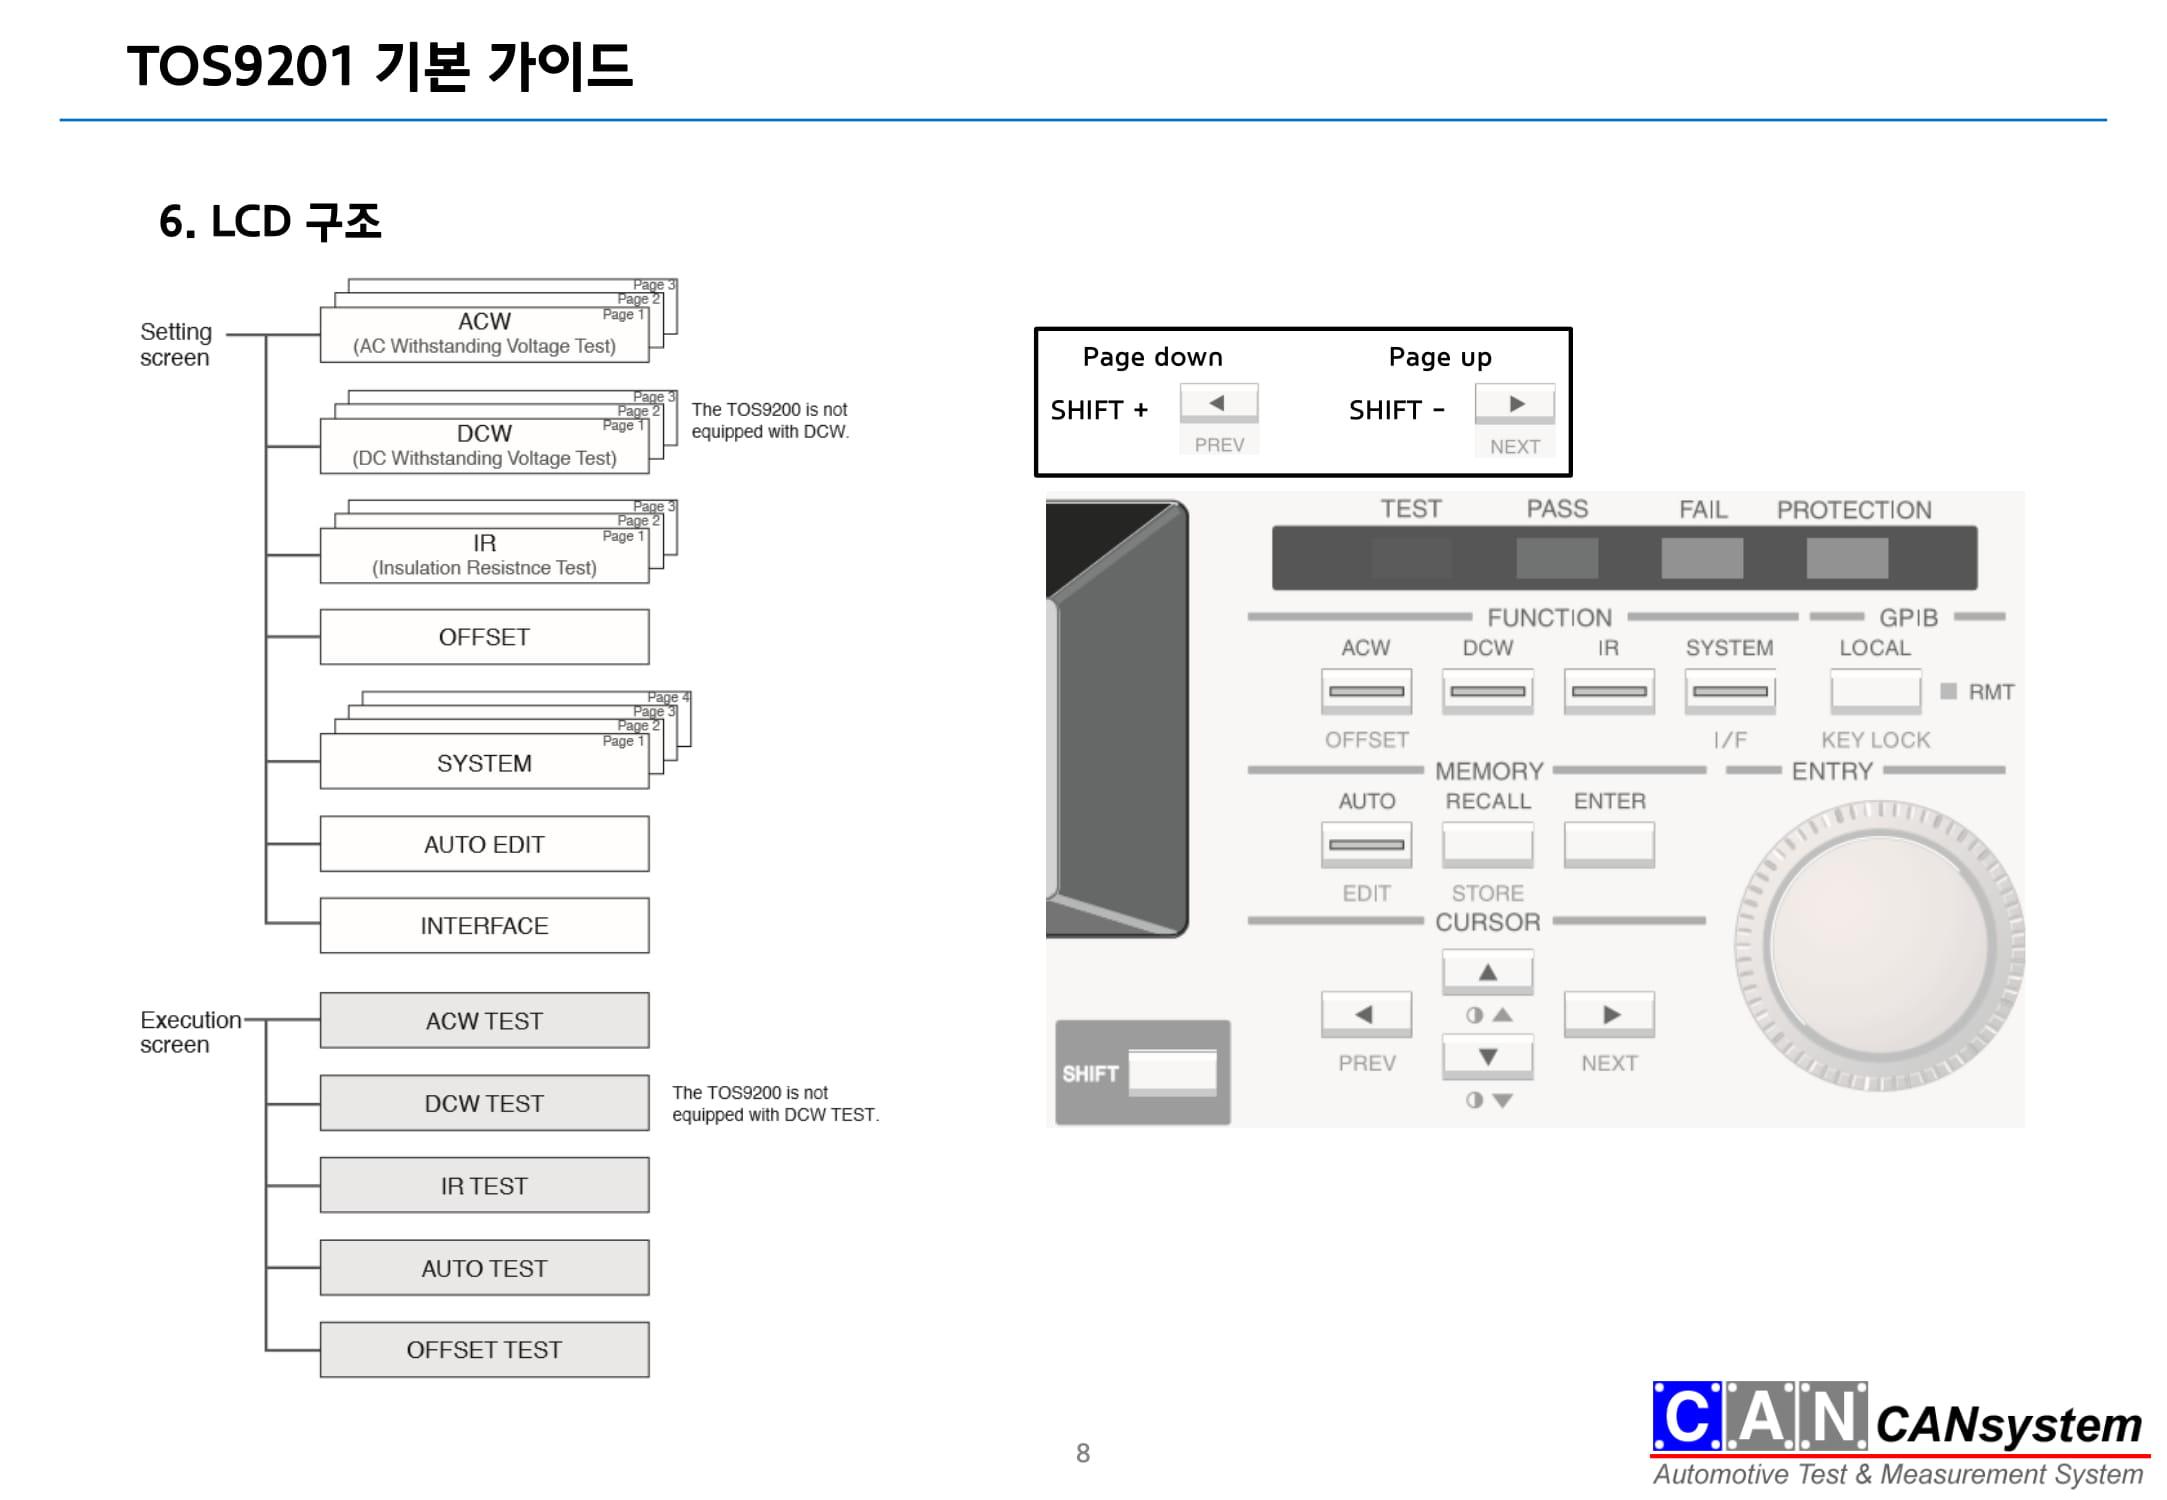 KIKUSUI TOS9201 국문 이용가이드-08.jpg